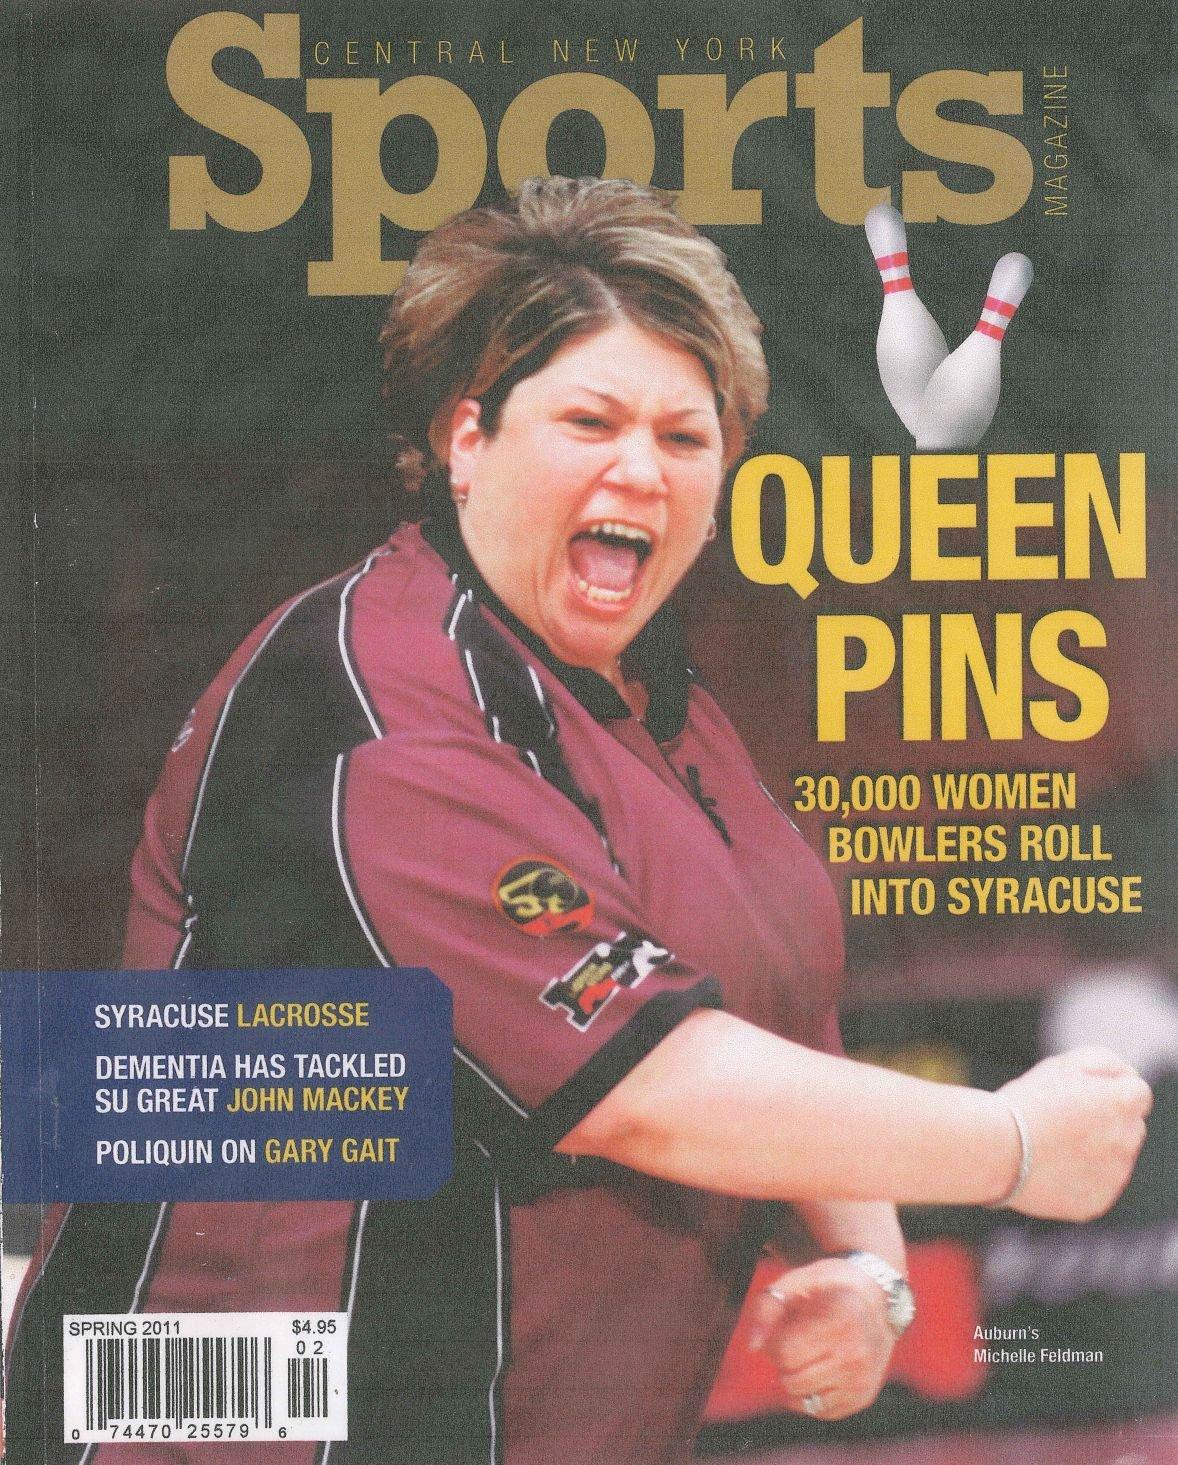 Michelle Feldman magazine cover